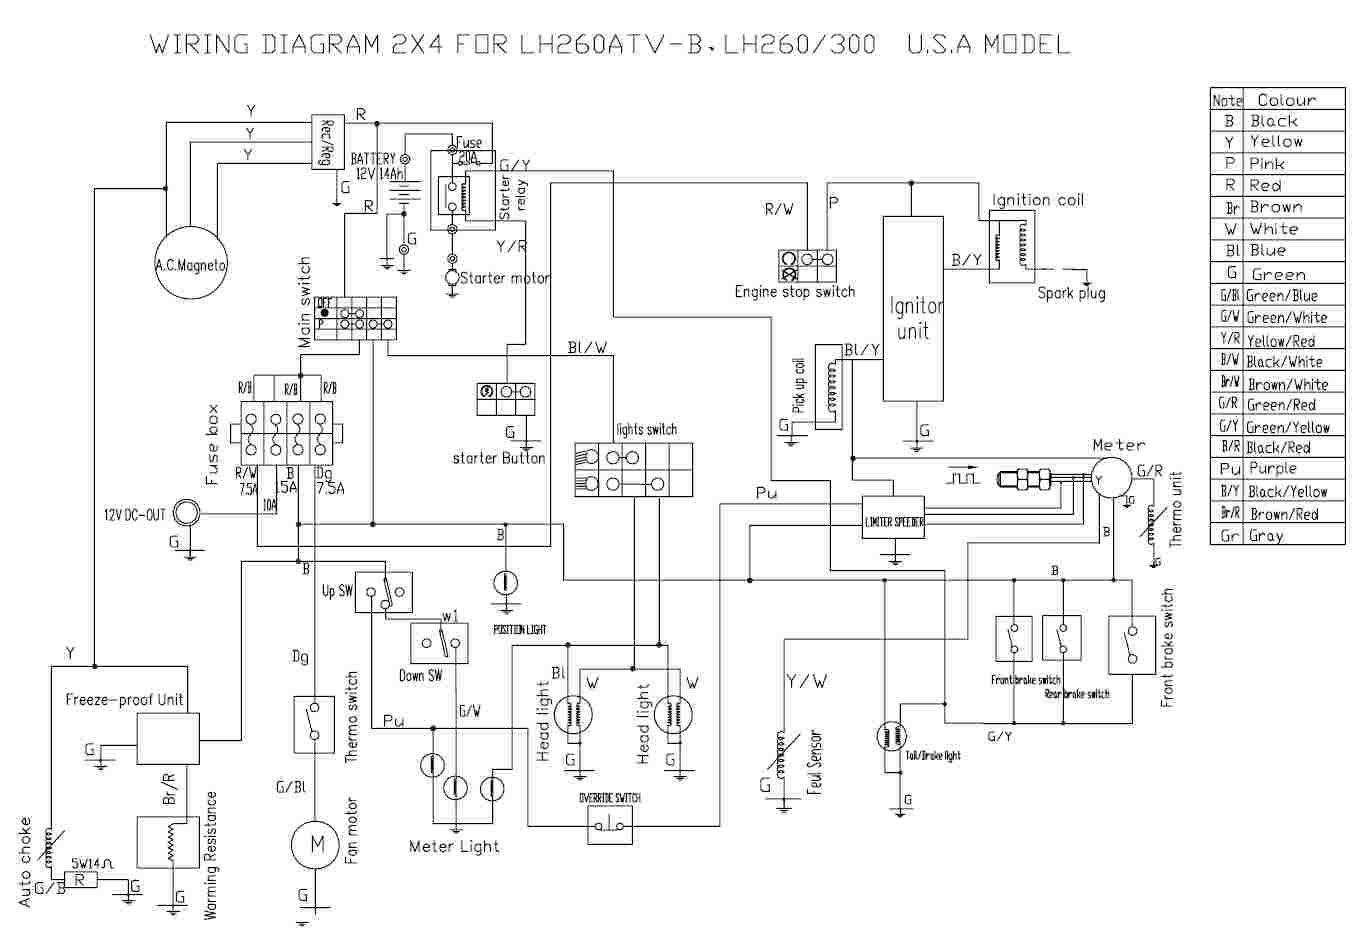 Swell Wiring Diagrams Atv Baja 250 Linhai 2005 Motorsports Wiring Diagram Wiring Cloud Biosomenaidewilluminateatxorg